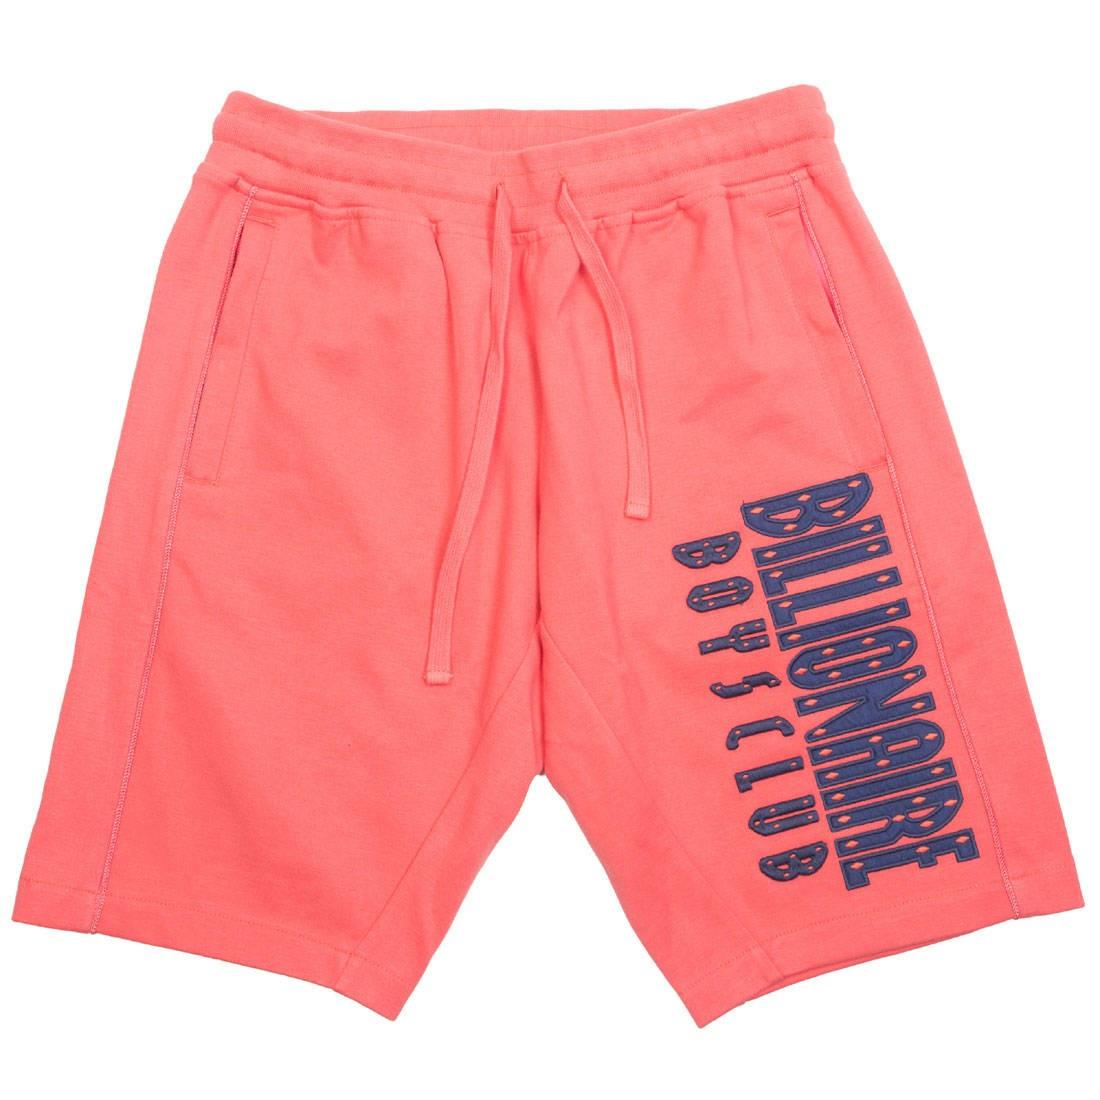 Billionaire Boys Club Men Straight Font Shorts (pink / rose)